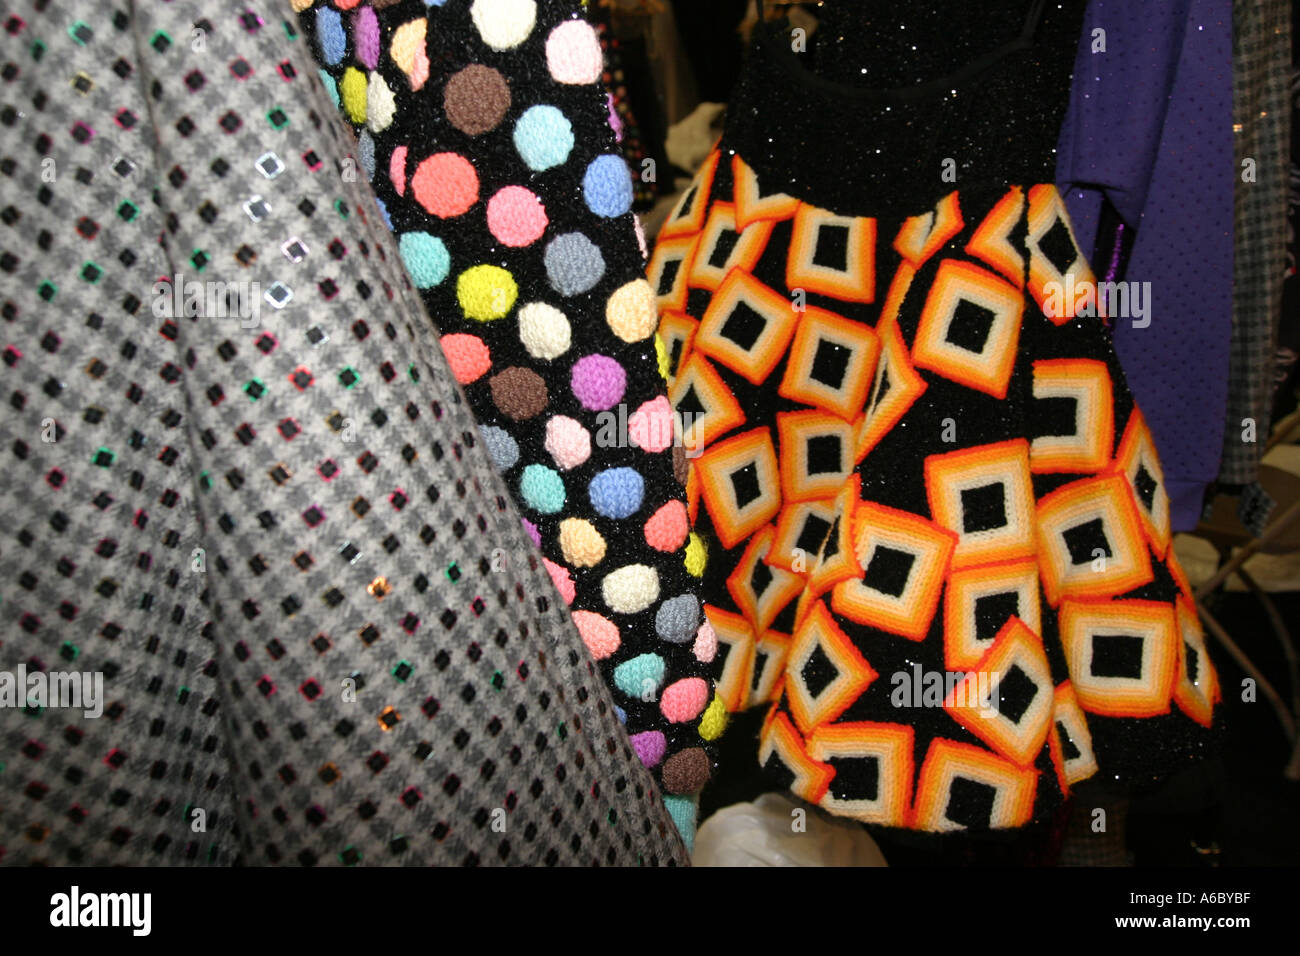 Dresses - London Fashion Week - Stock Image